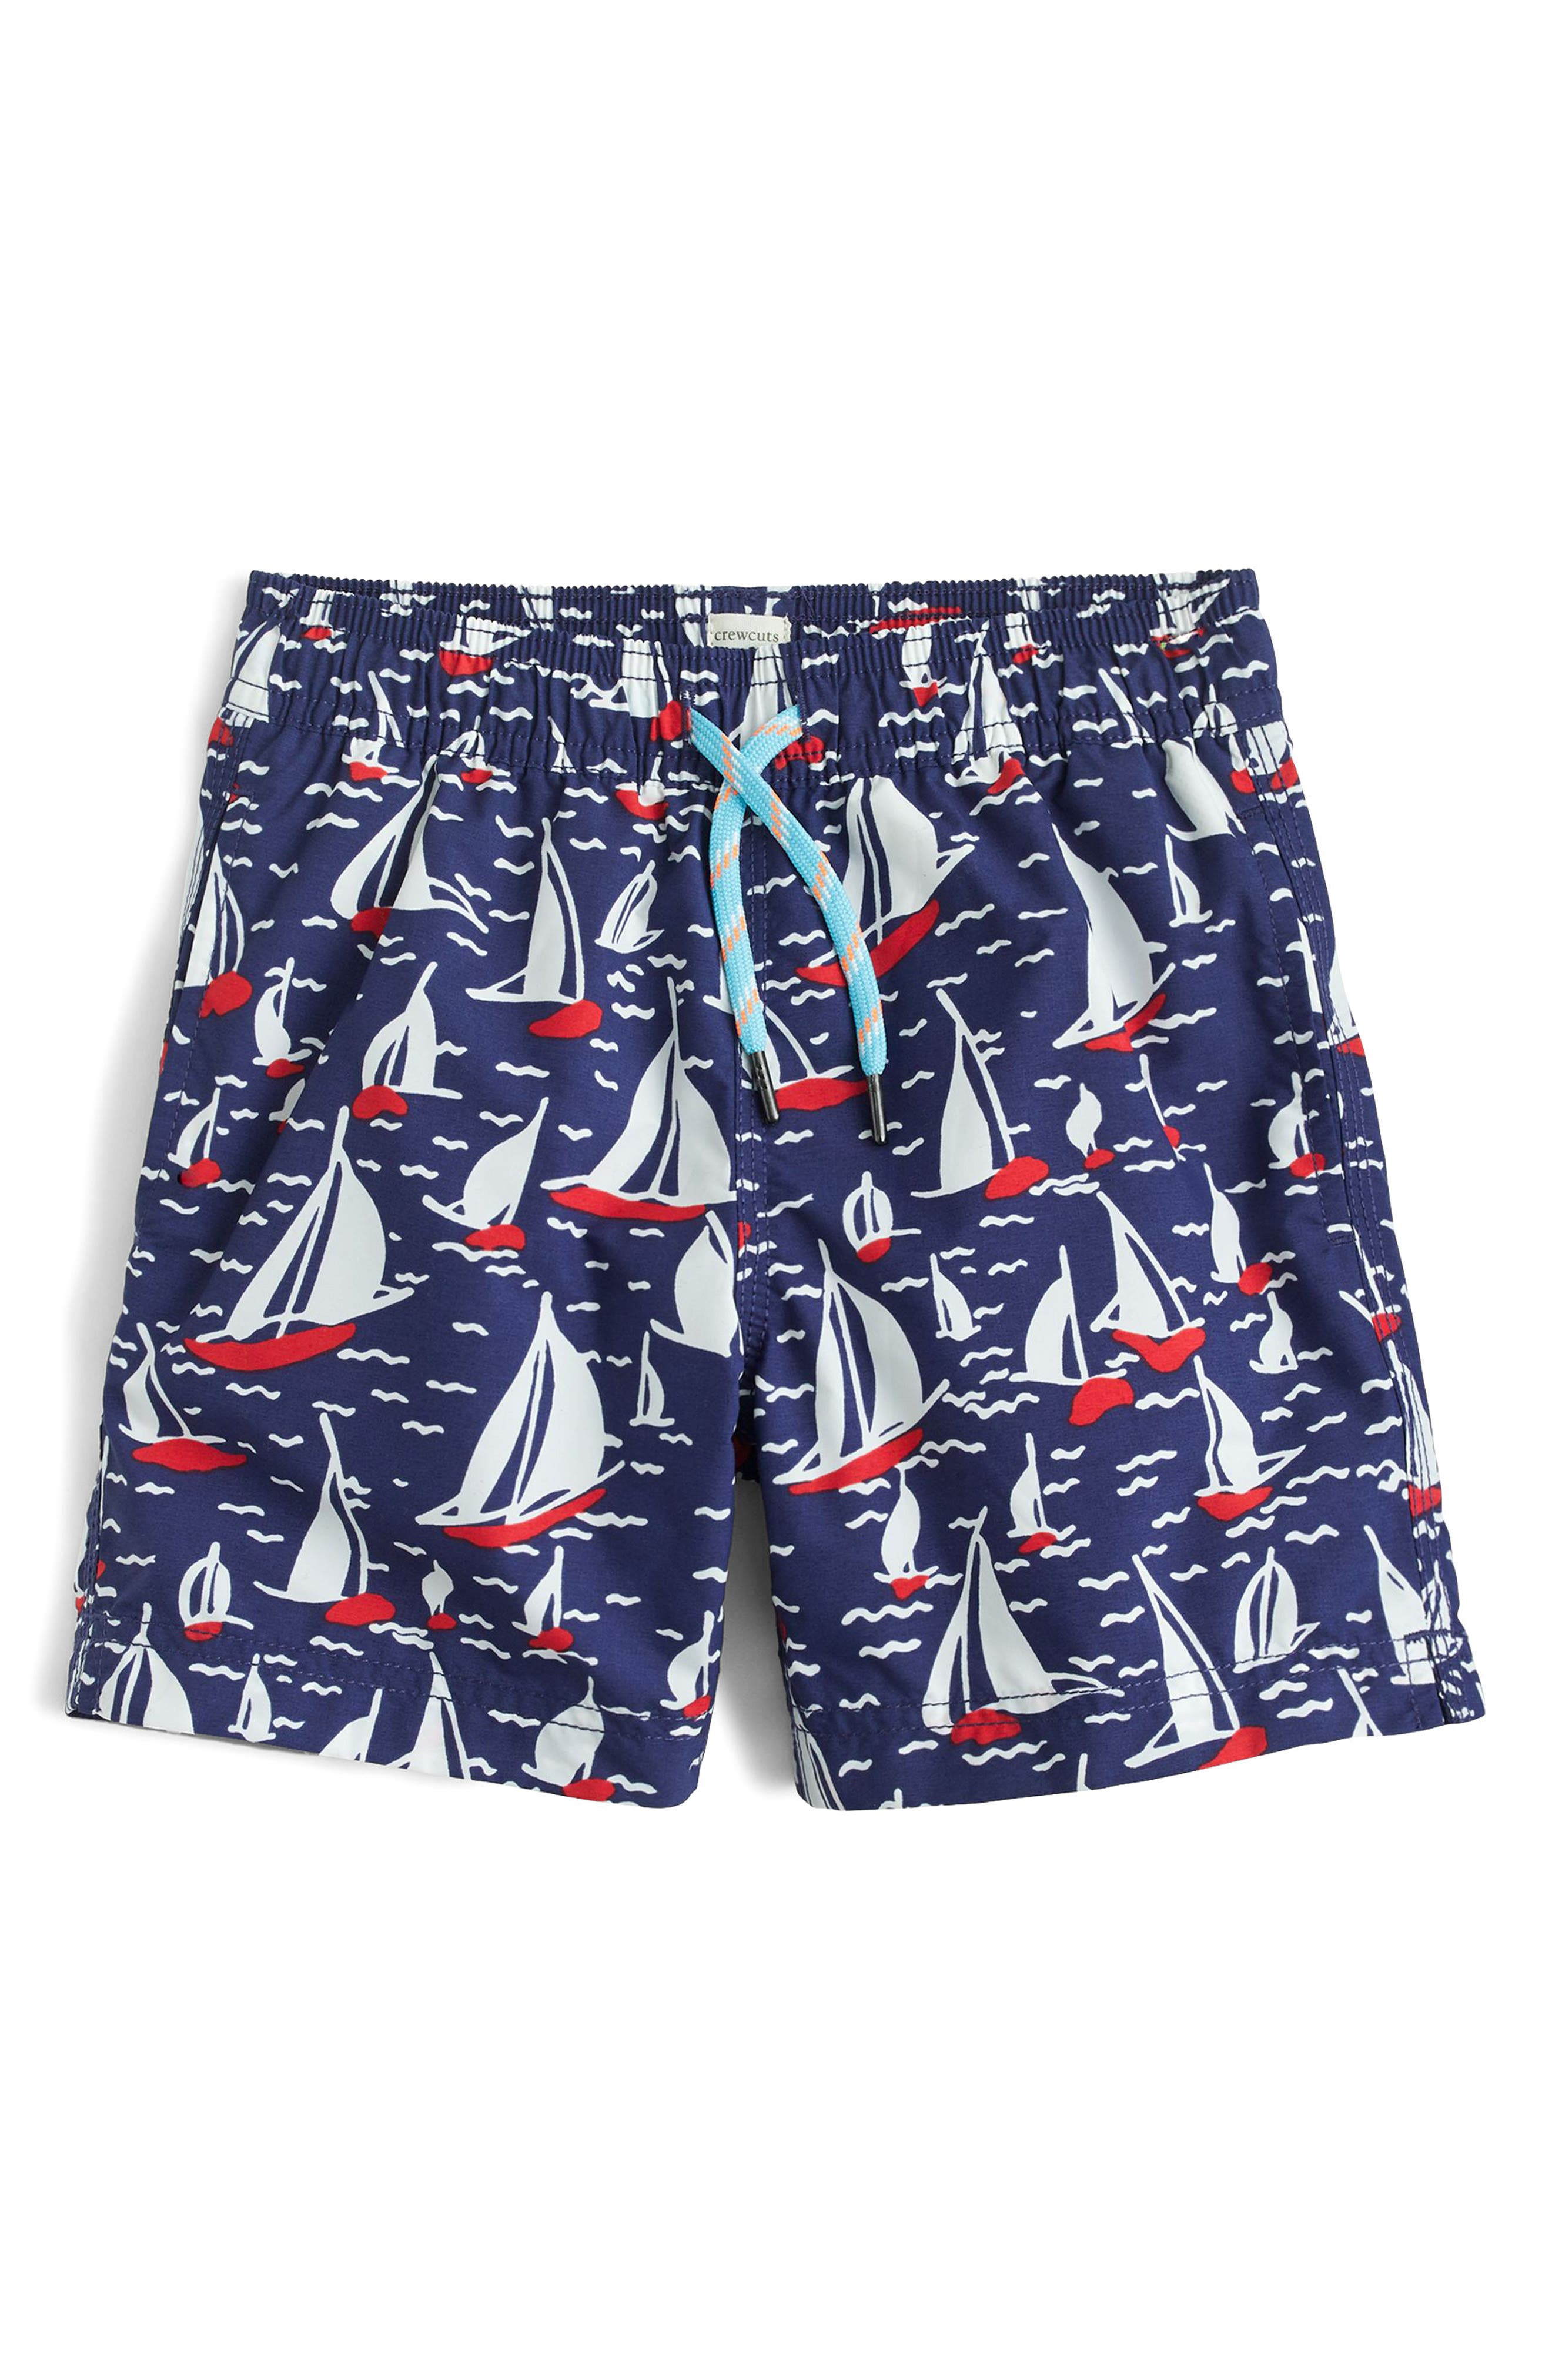 Sailboat Swim Trunks,                         Main,                         color, Navy Seas